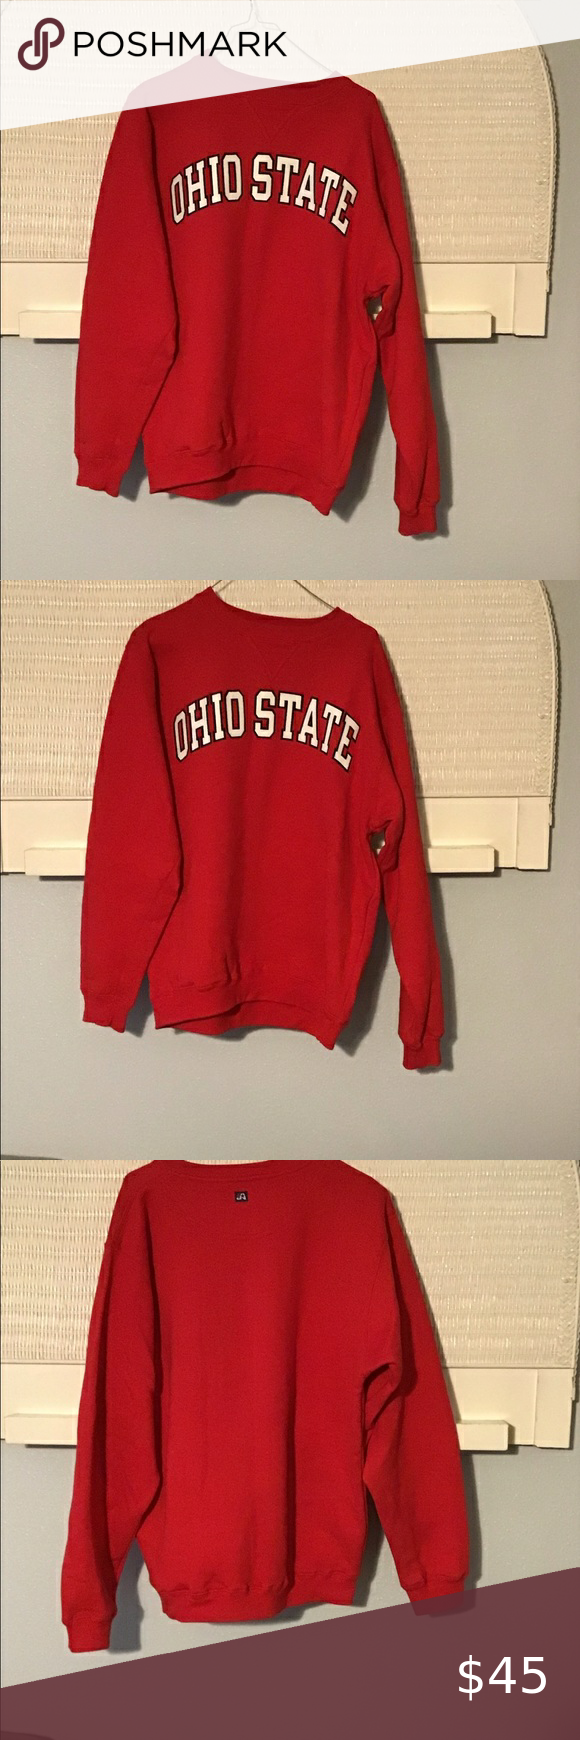 Ohio State Men S Sweatshirt Sweatshirts Sweatshirt Shirt Mens Sweatshirts [ 1740 x 580 Pixel ]